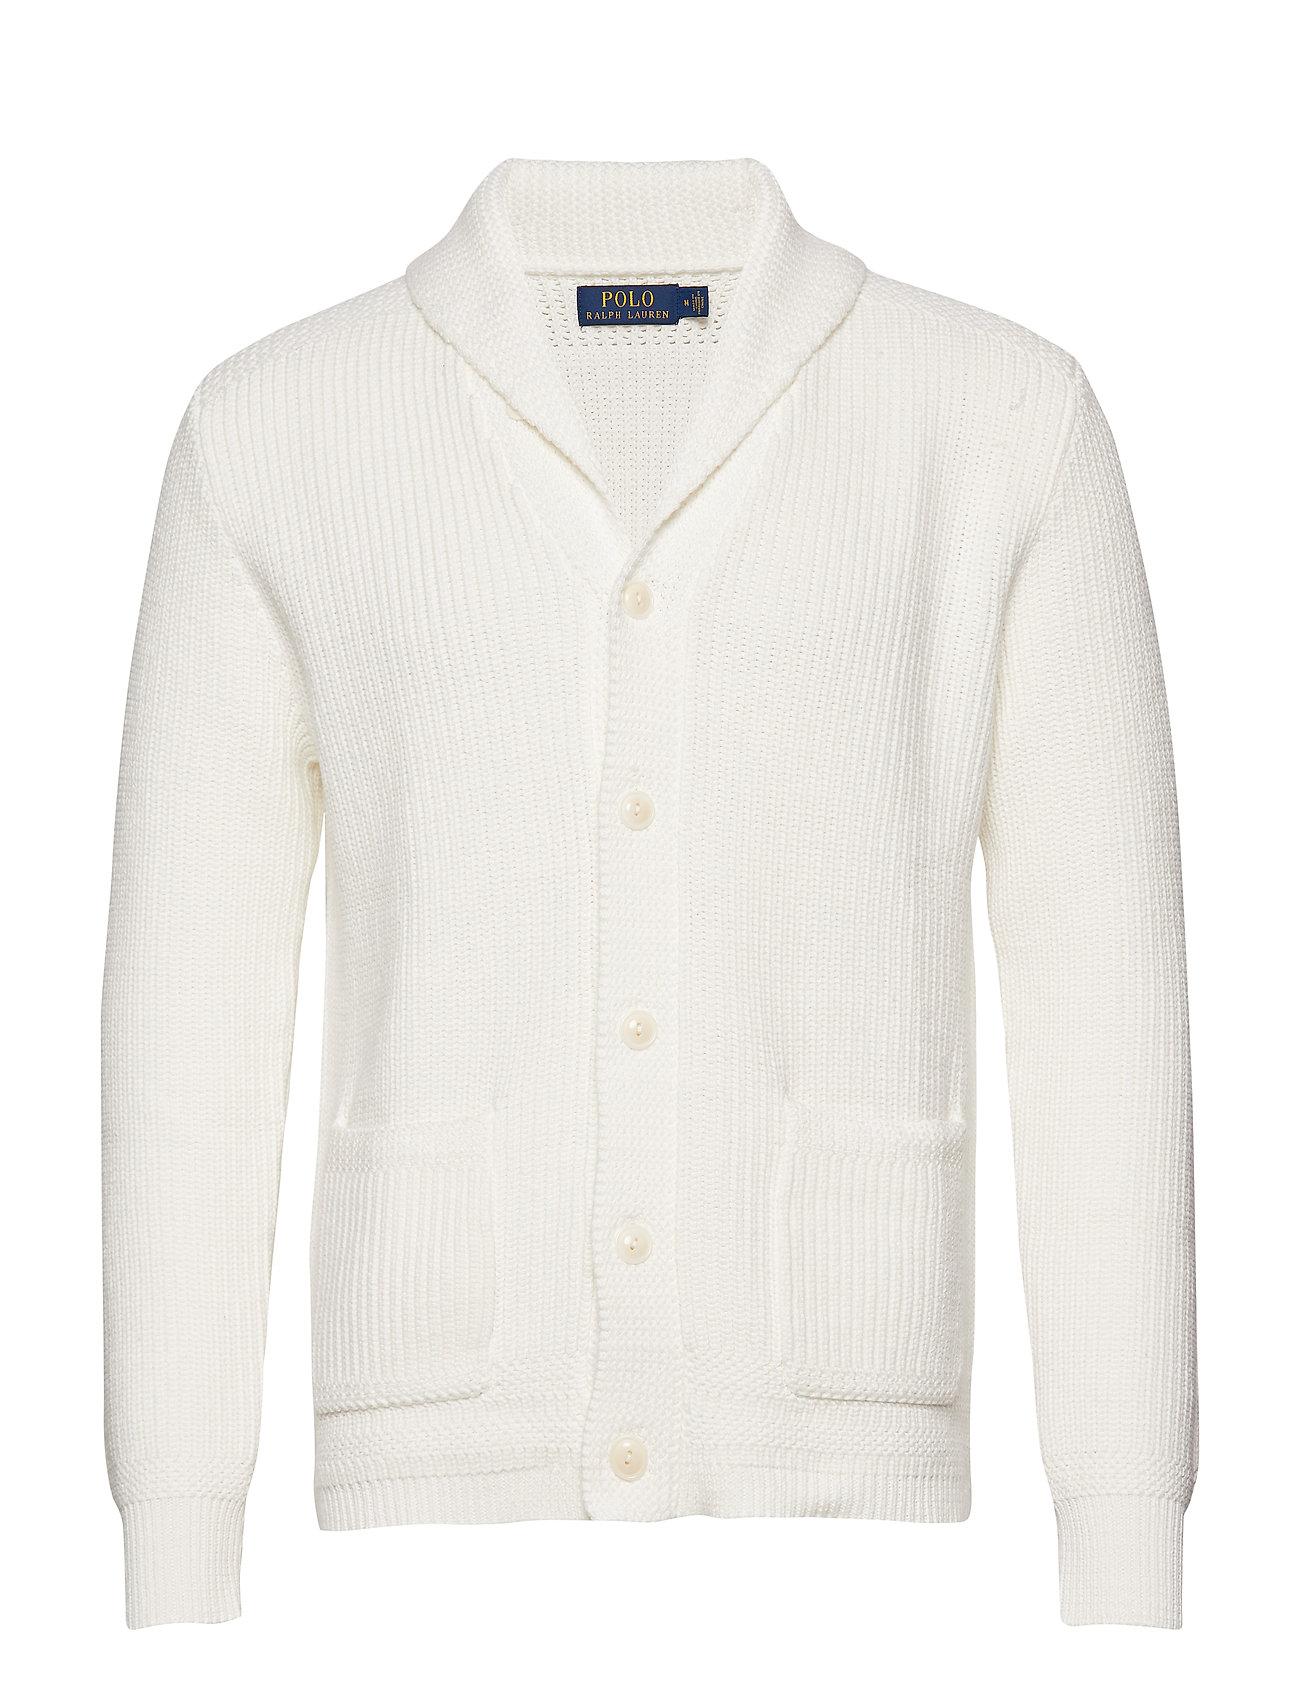 Polo Ralph Lauren Cotton Shawl-Collar Cardigan - WHITE